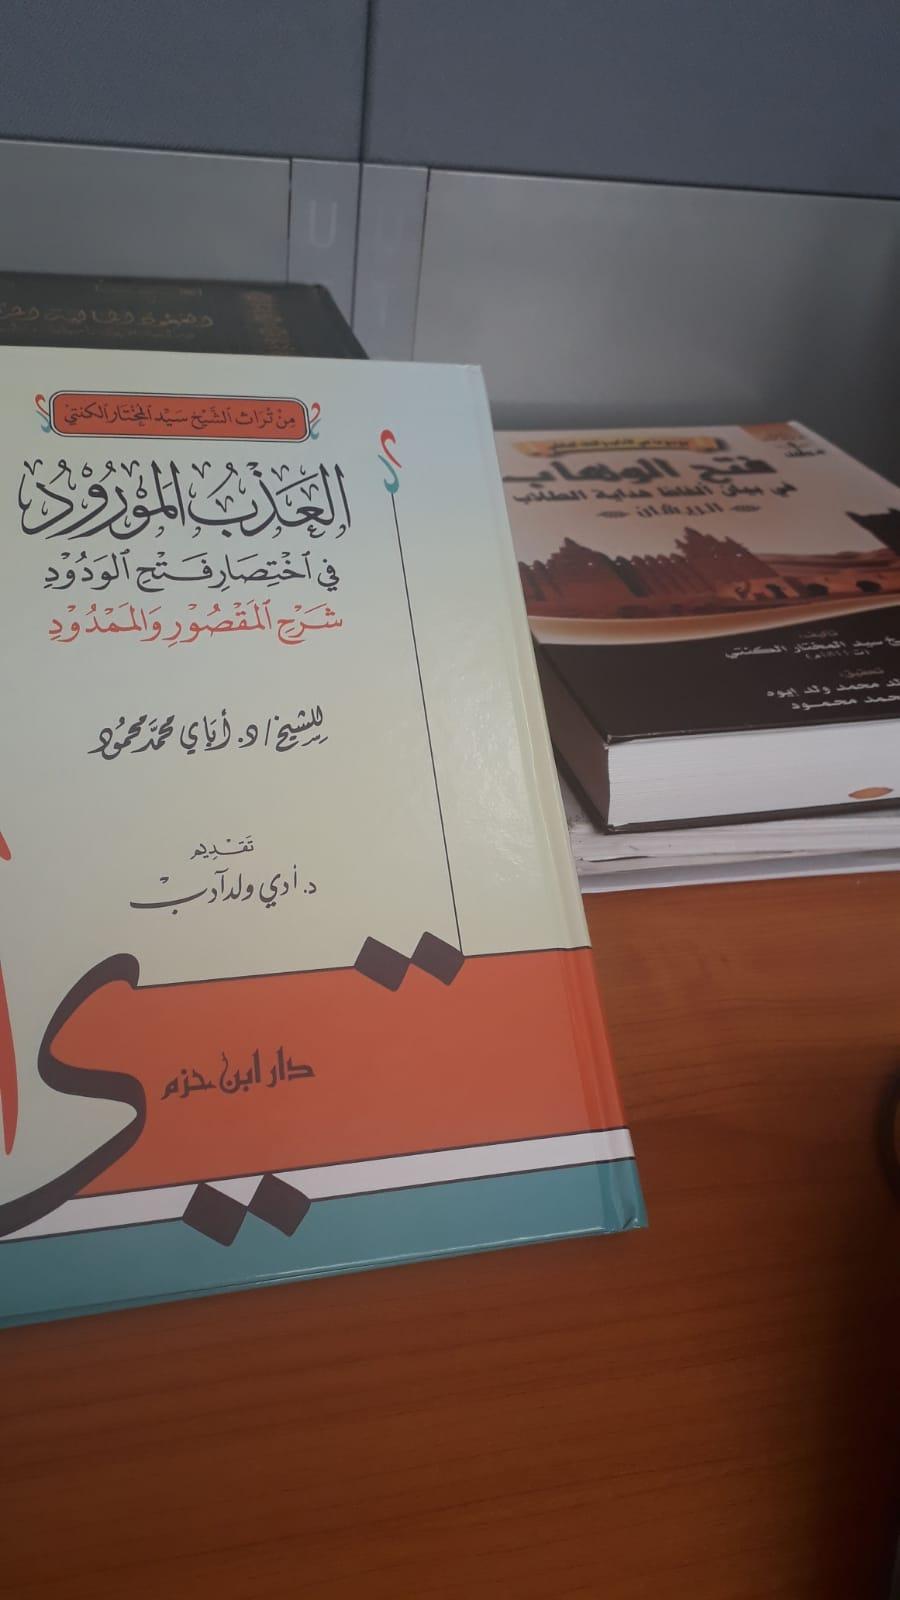 9dd7f6803 صدورتأليف جديد بعنوان: العذب المورود فى اختصار فتح الودود للدكتور أبايه  محمد محمود